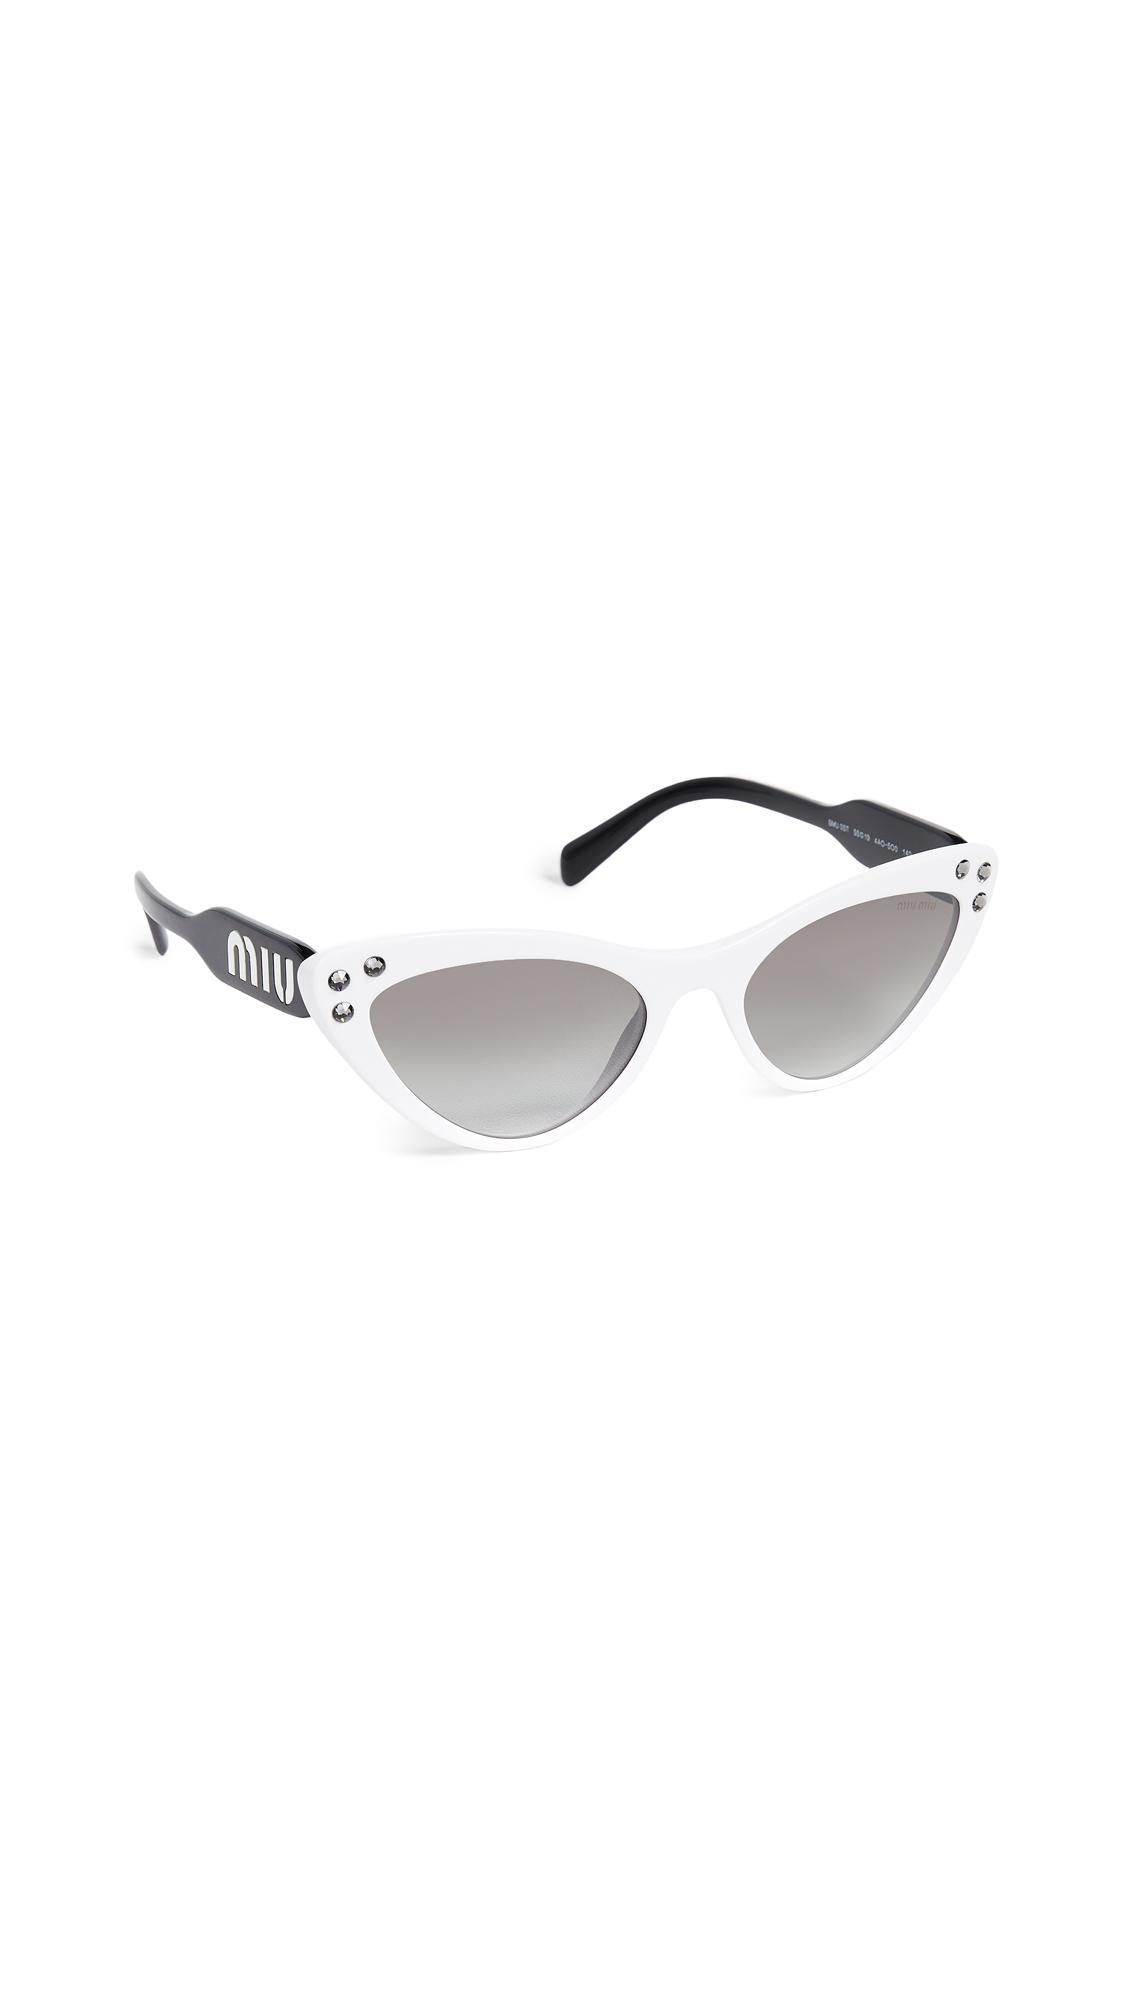 2c98f2ce53b Lyst - Miu Miu Crystals Cat Eye Sunglasses